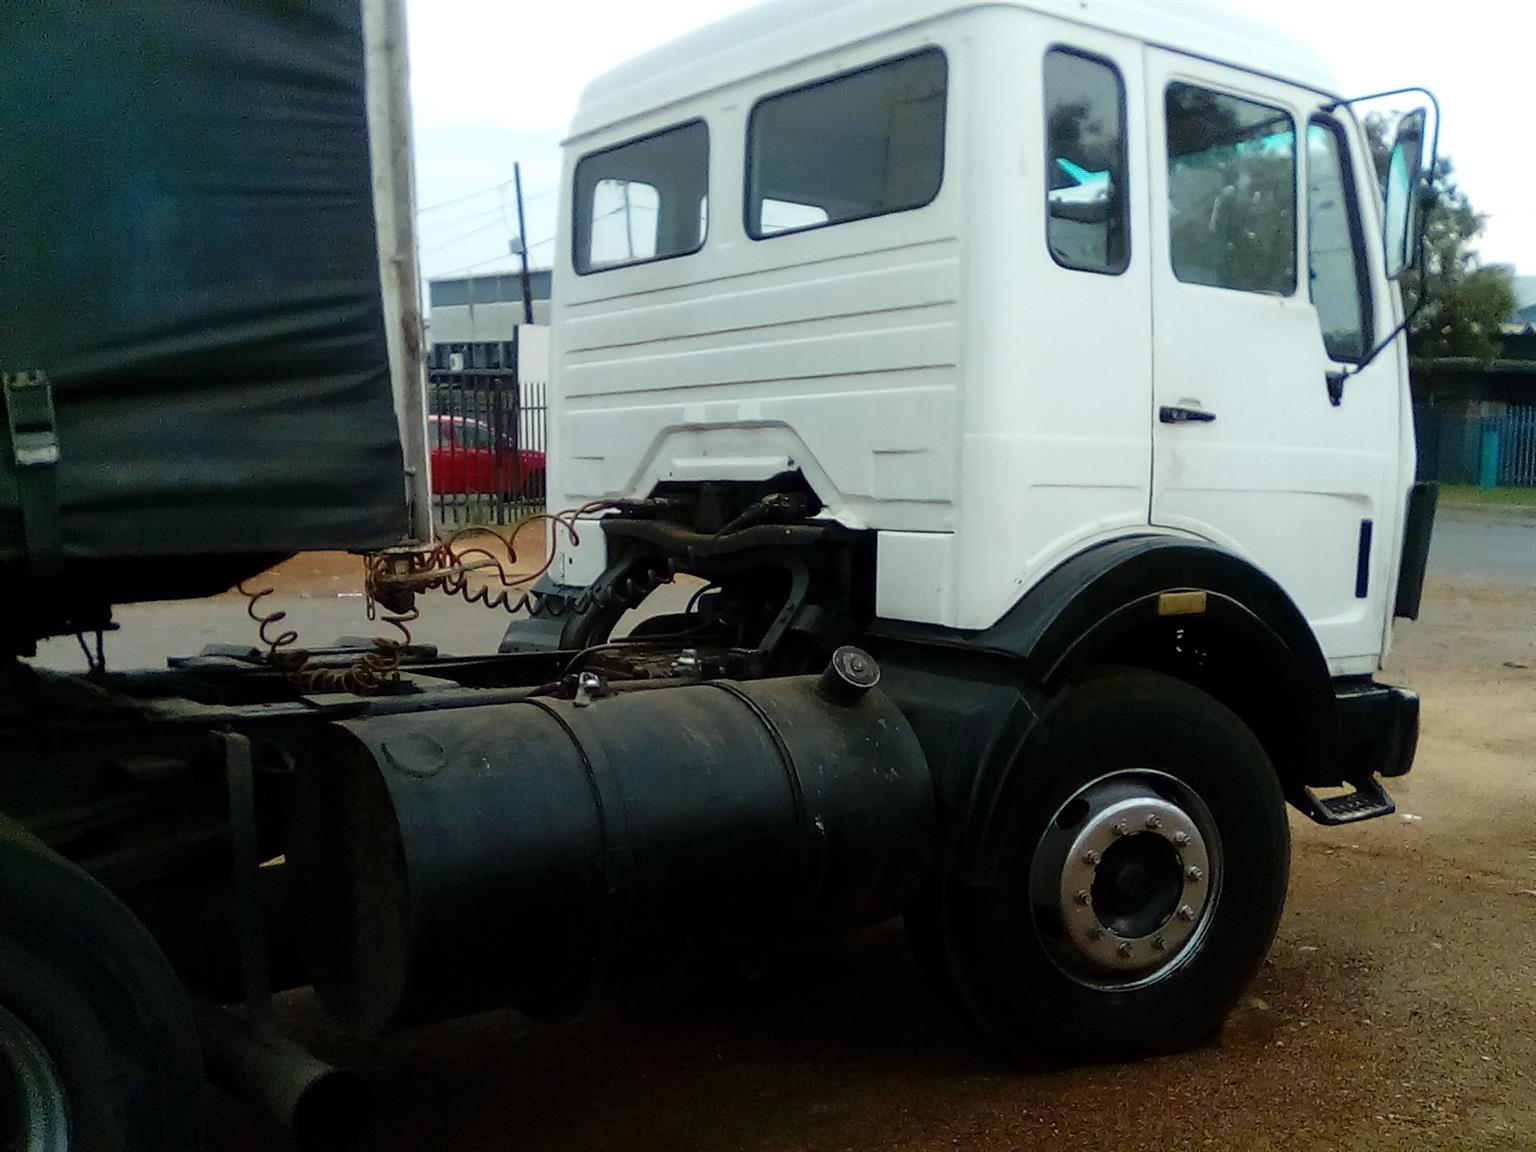 Mercedes Benz truck with trailer